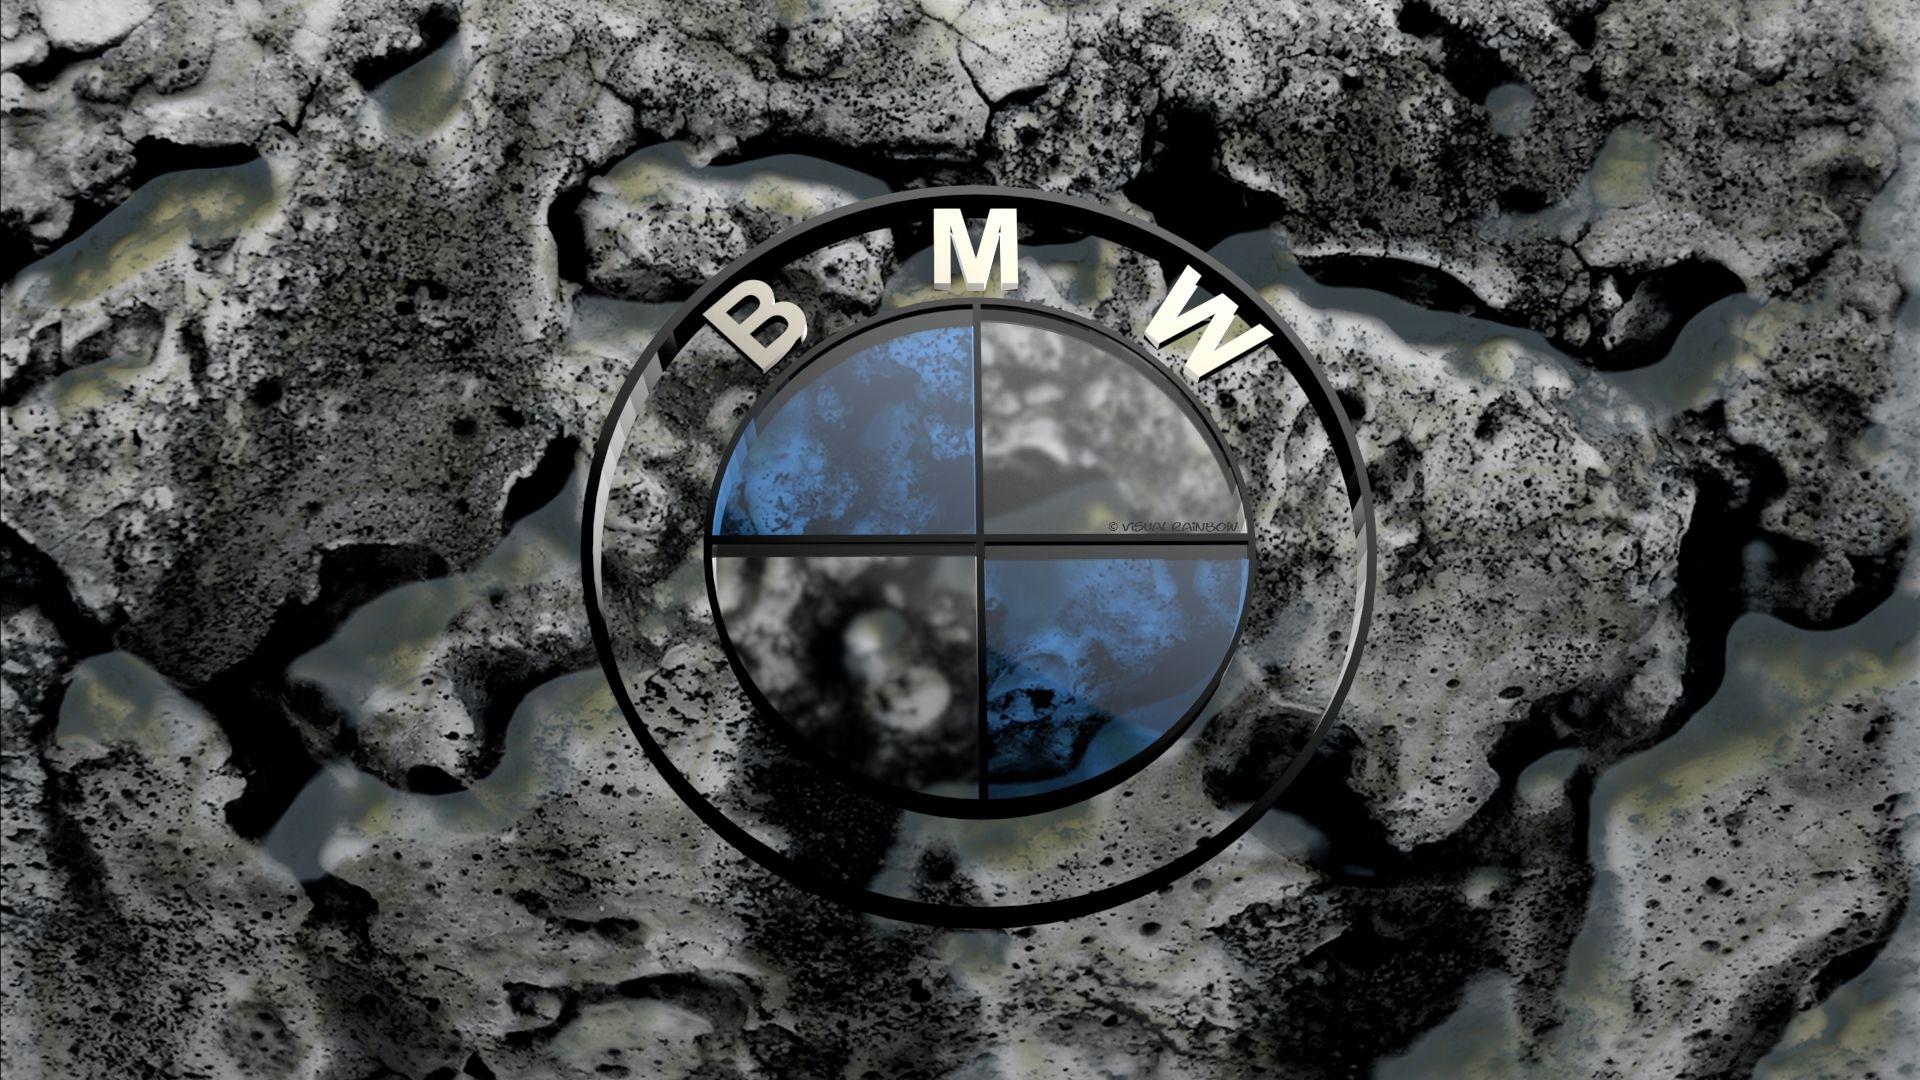 Bmw M Logo Iphone Wallpaper Ipod Wallpaper Hd Free Download Bmw Bmw Logo Wallpaper Bmw Logo